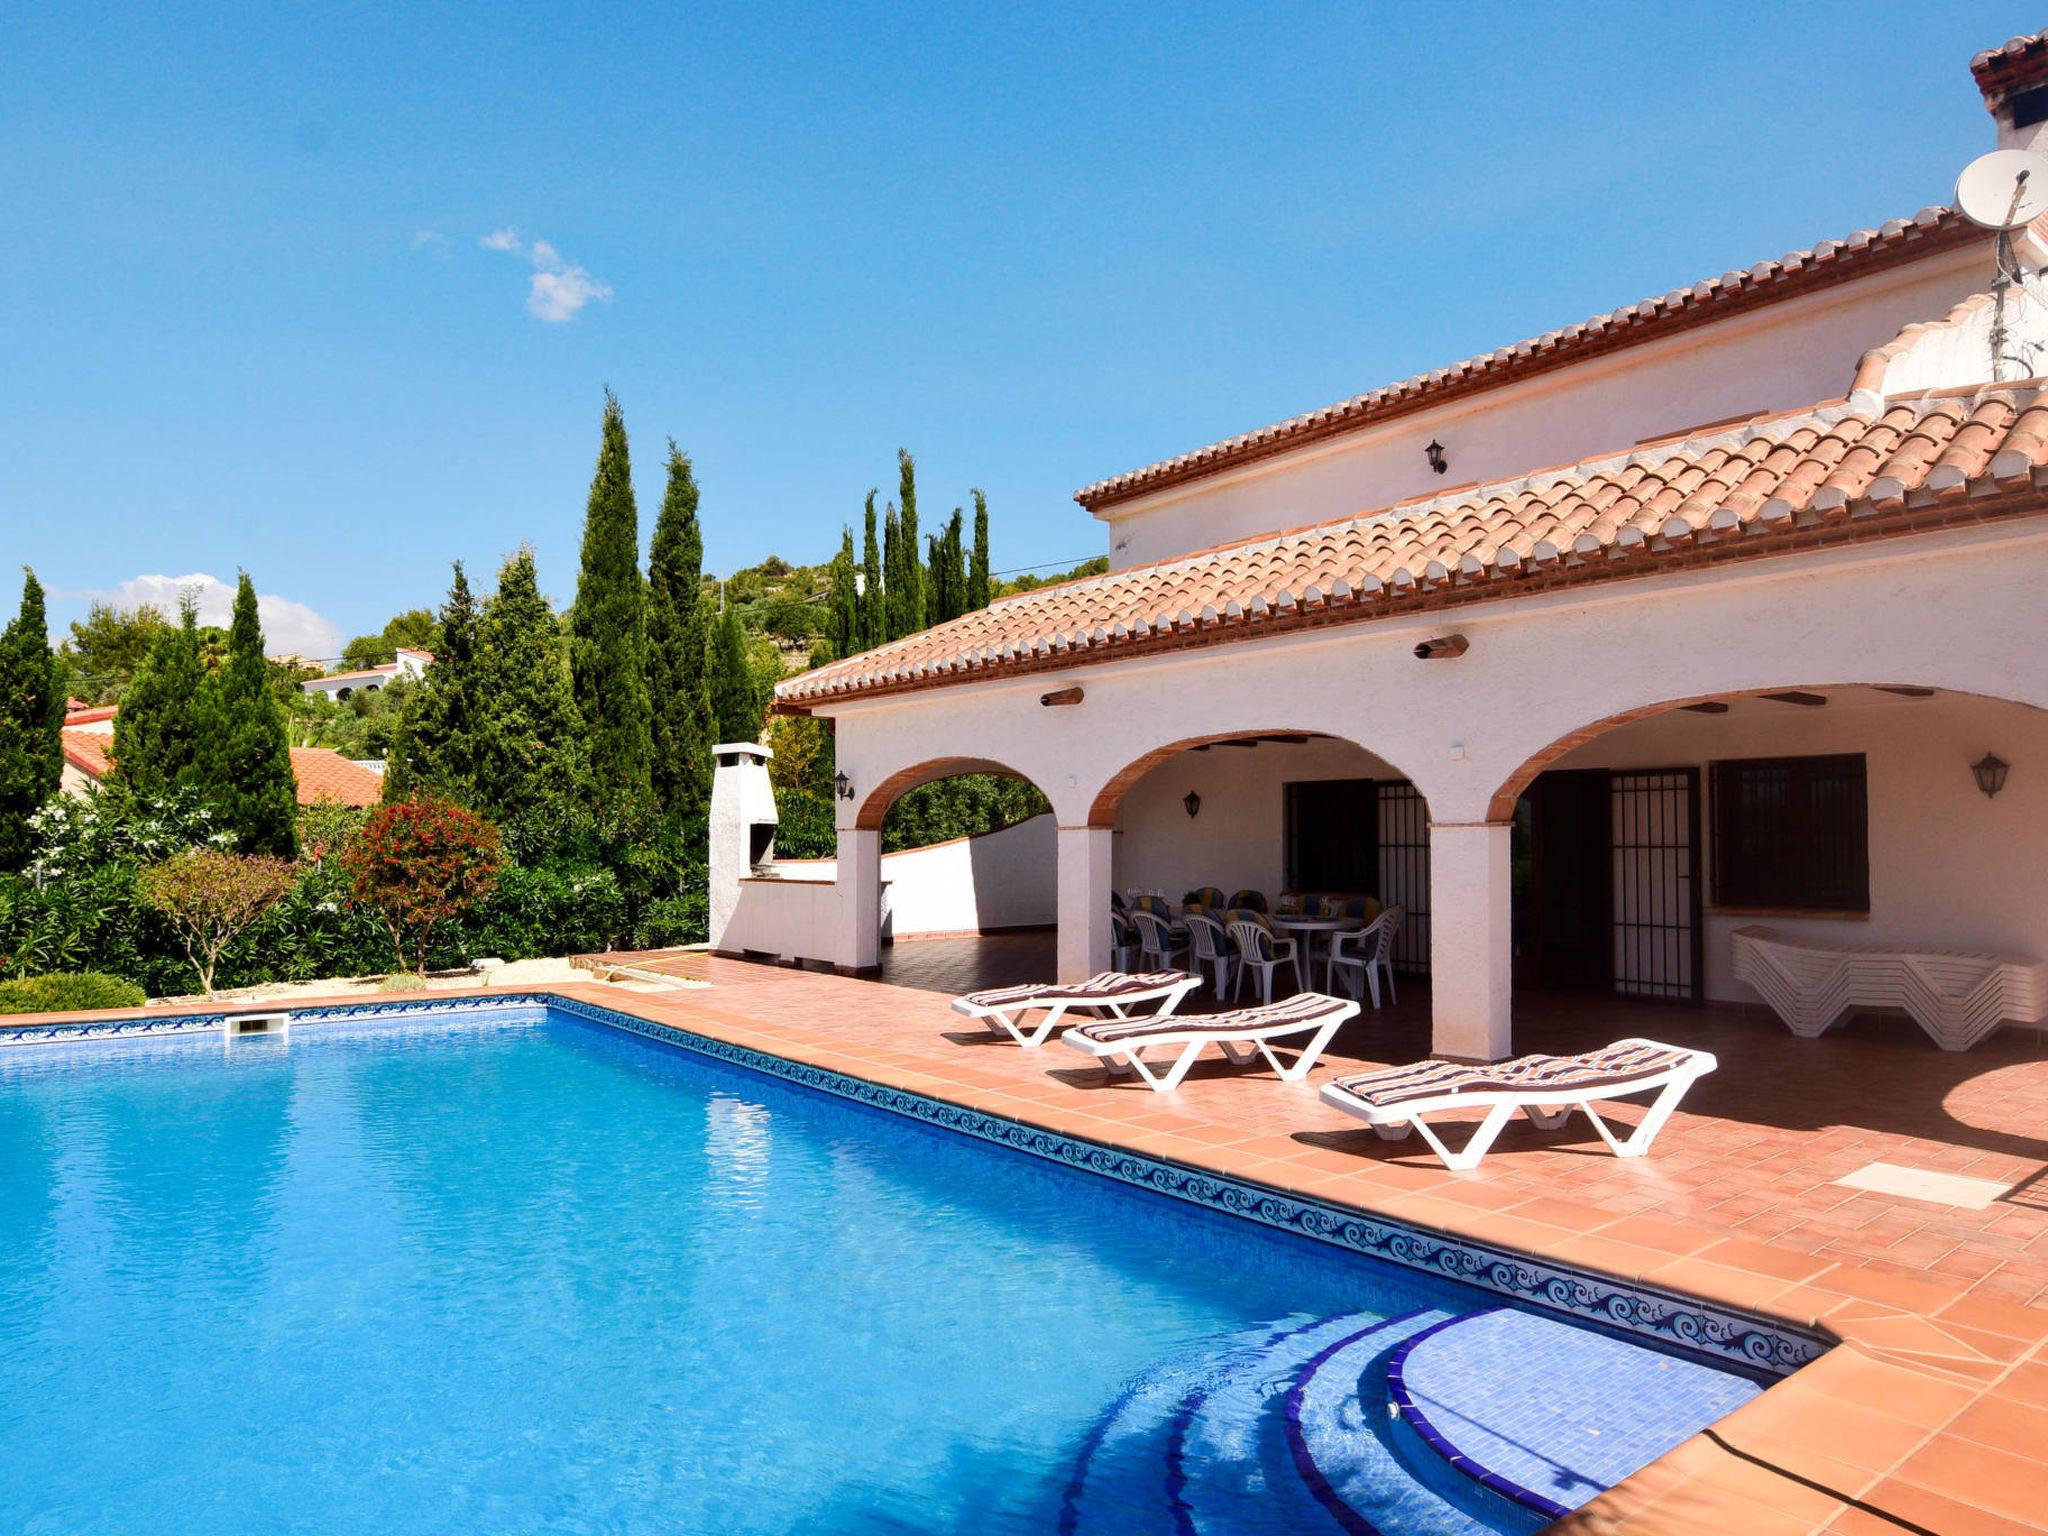 Villa Thecocons,Moraira,Costa Blanca #1